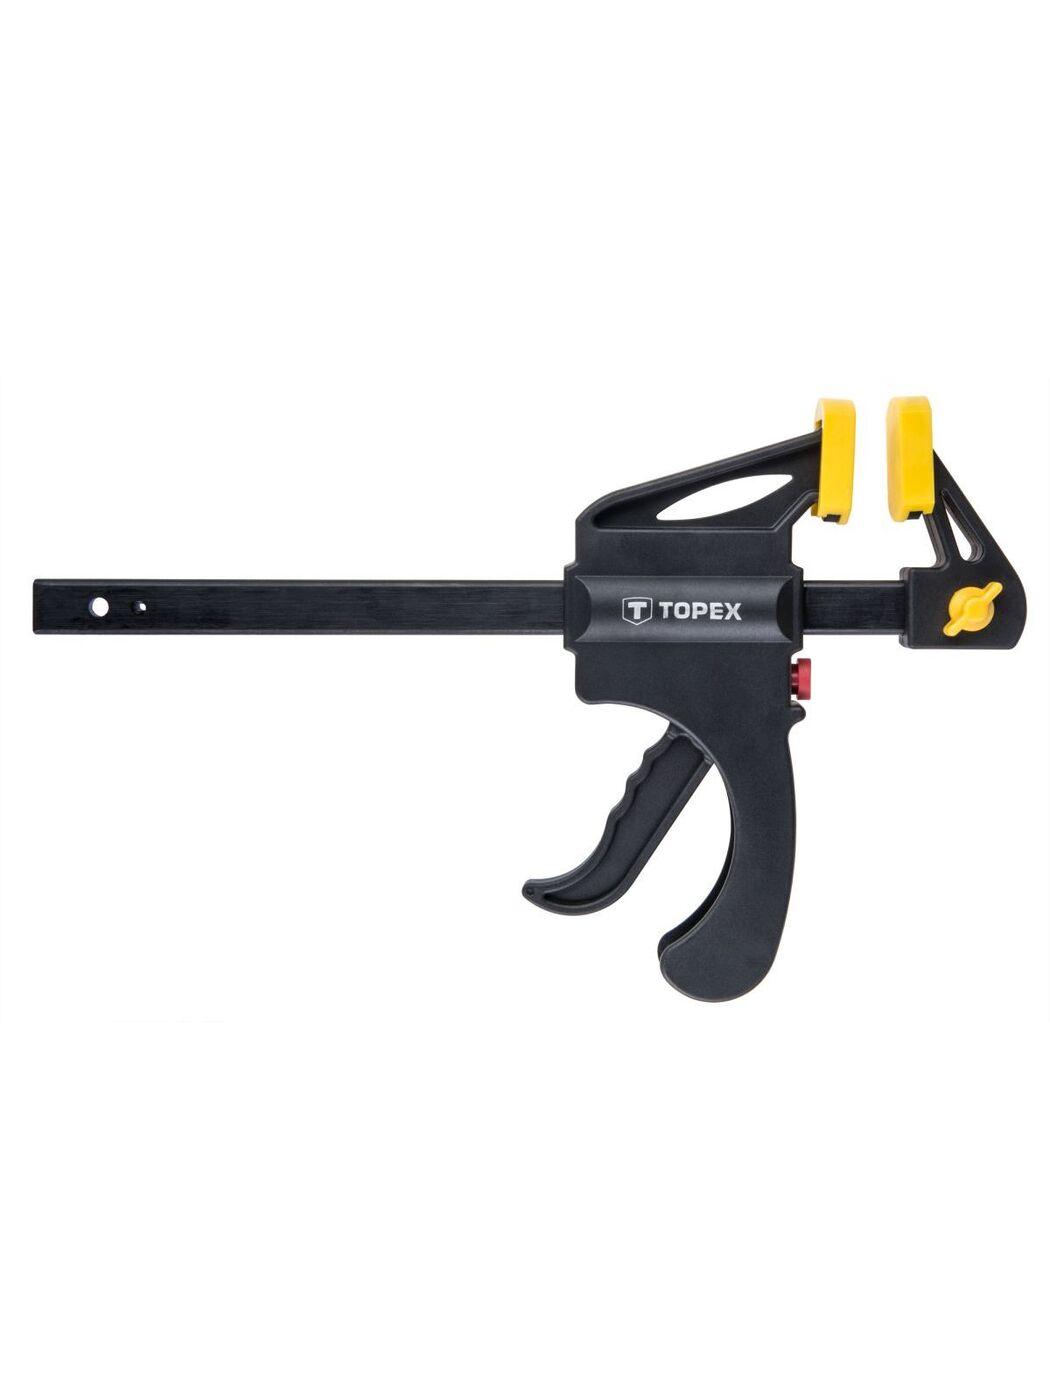 Струбцина автоматическая 150 x 60 мм Topex 12A515